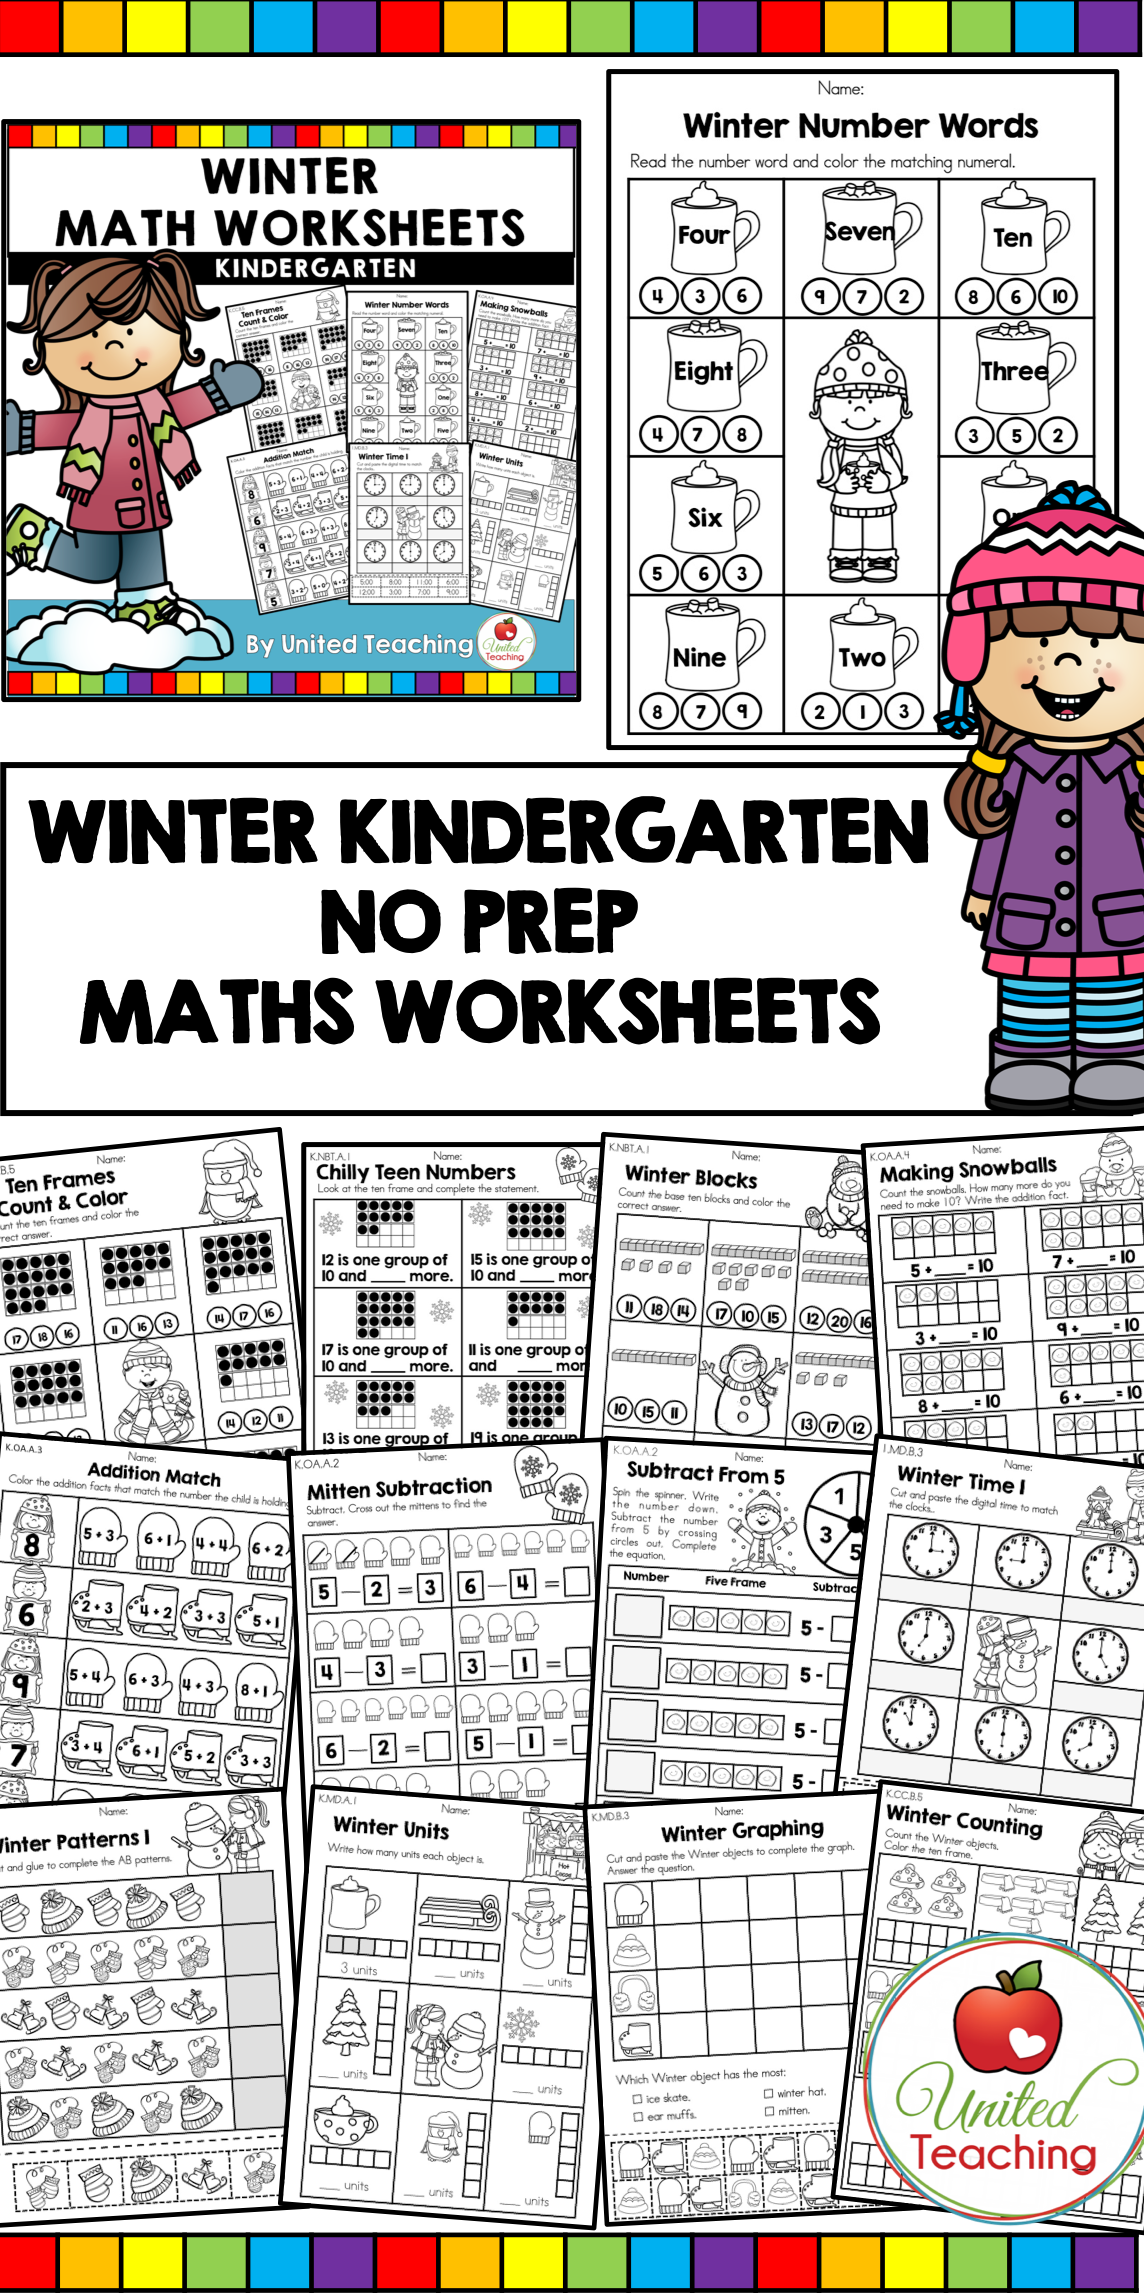 Winter Math Worksheets Kindergarten